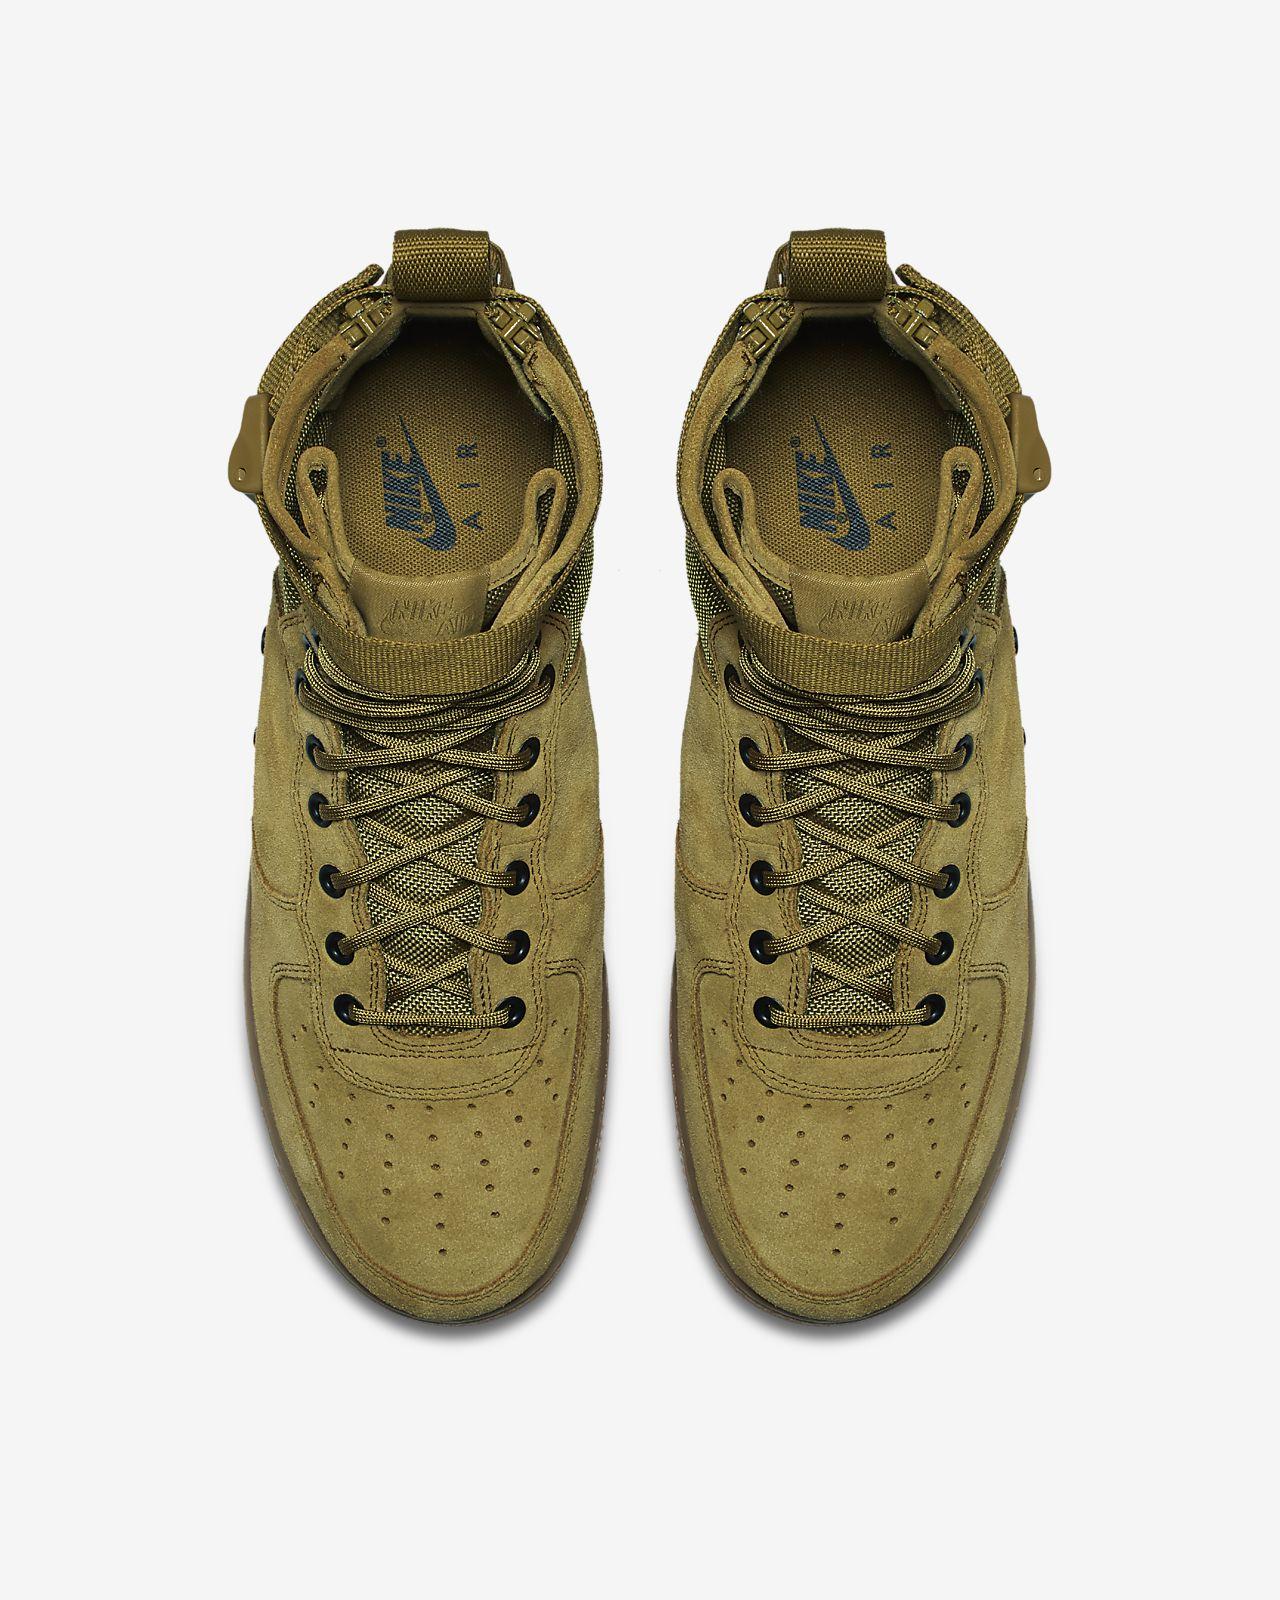 Pour Chaussure Mid Homme 1 Force Sf Nike Air hrtsCxdQ